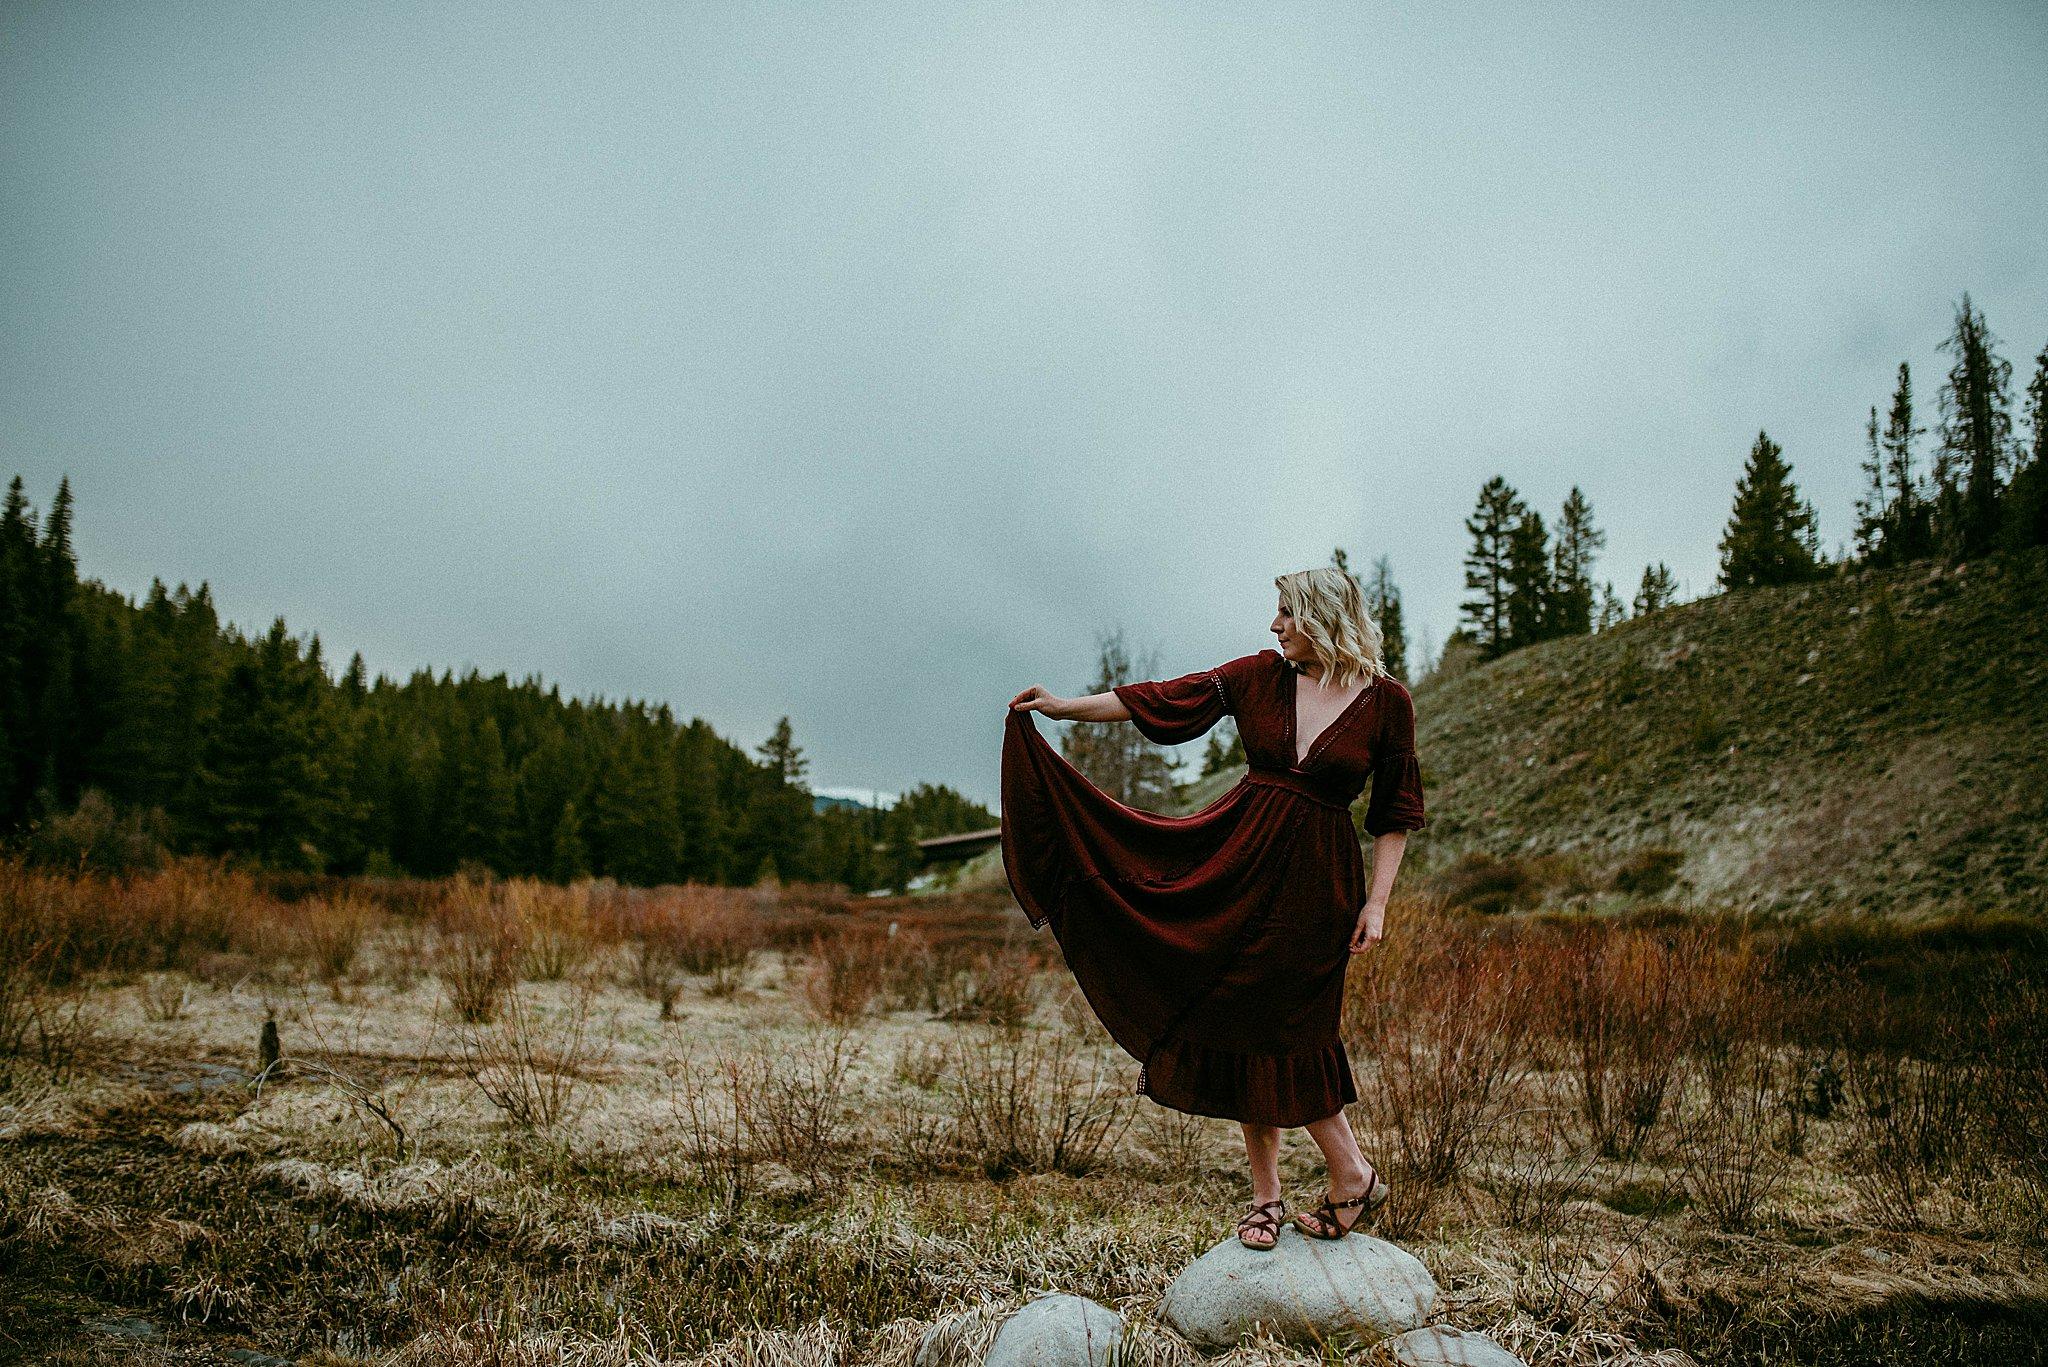 Jessica B Tworek of Jessica Beth Photography